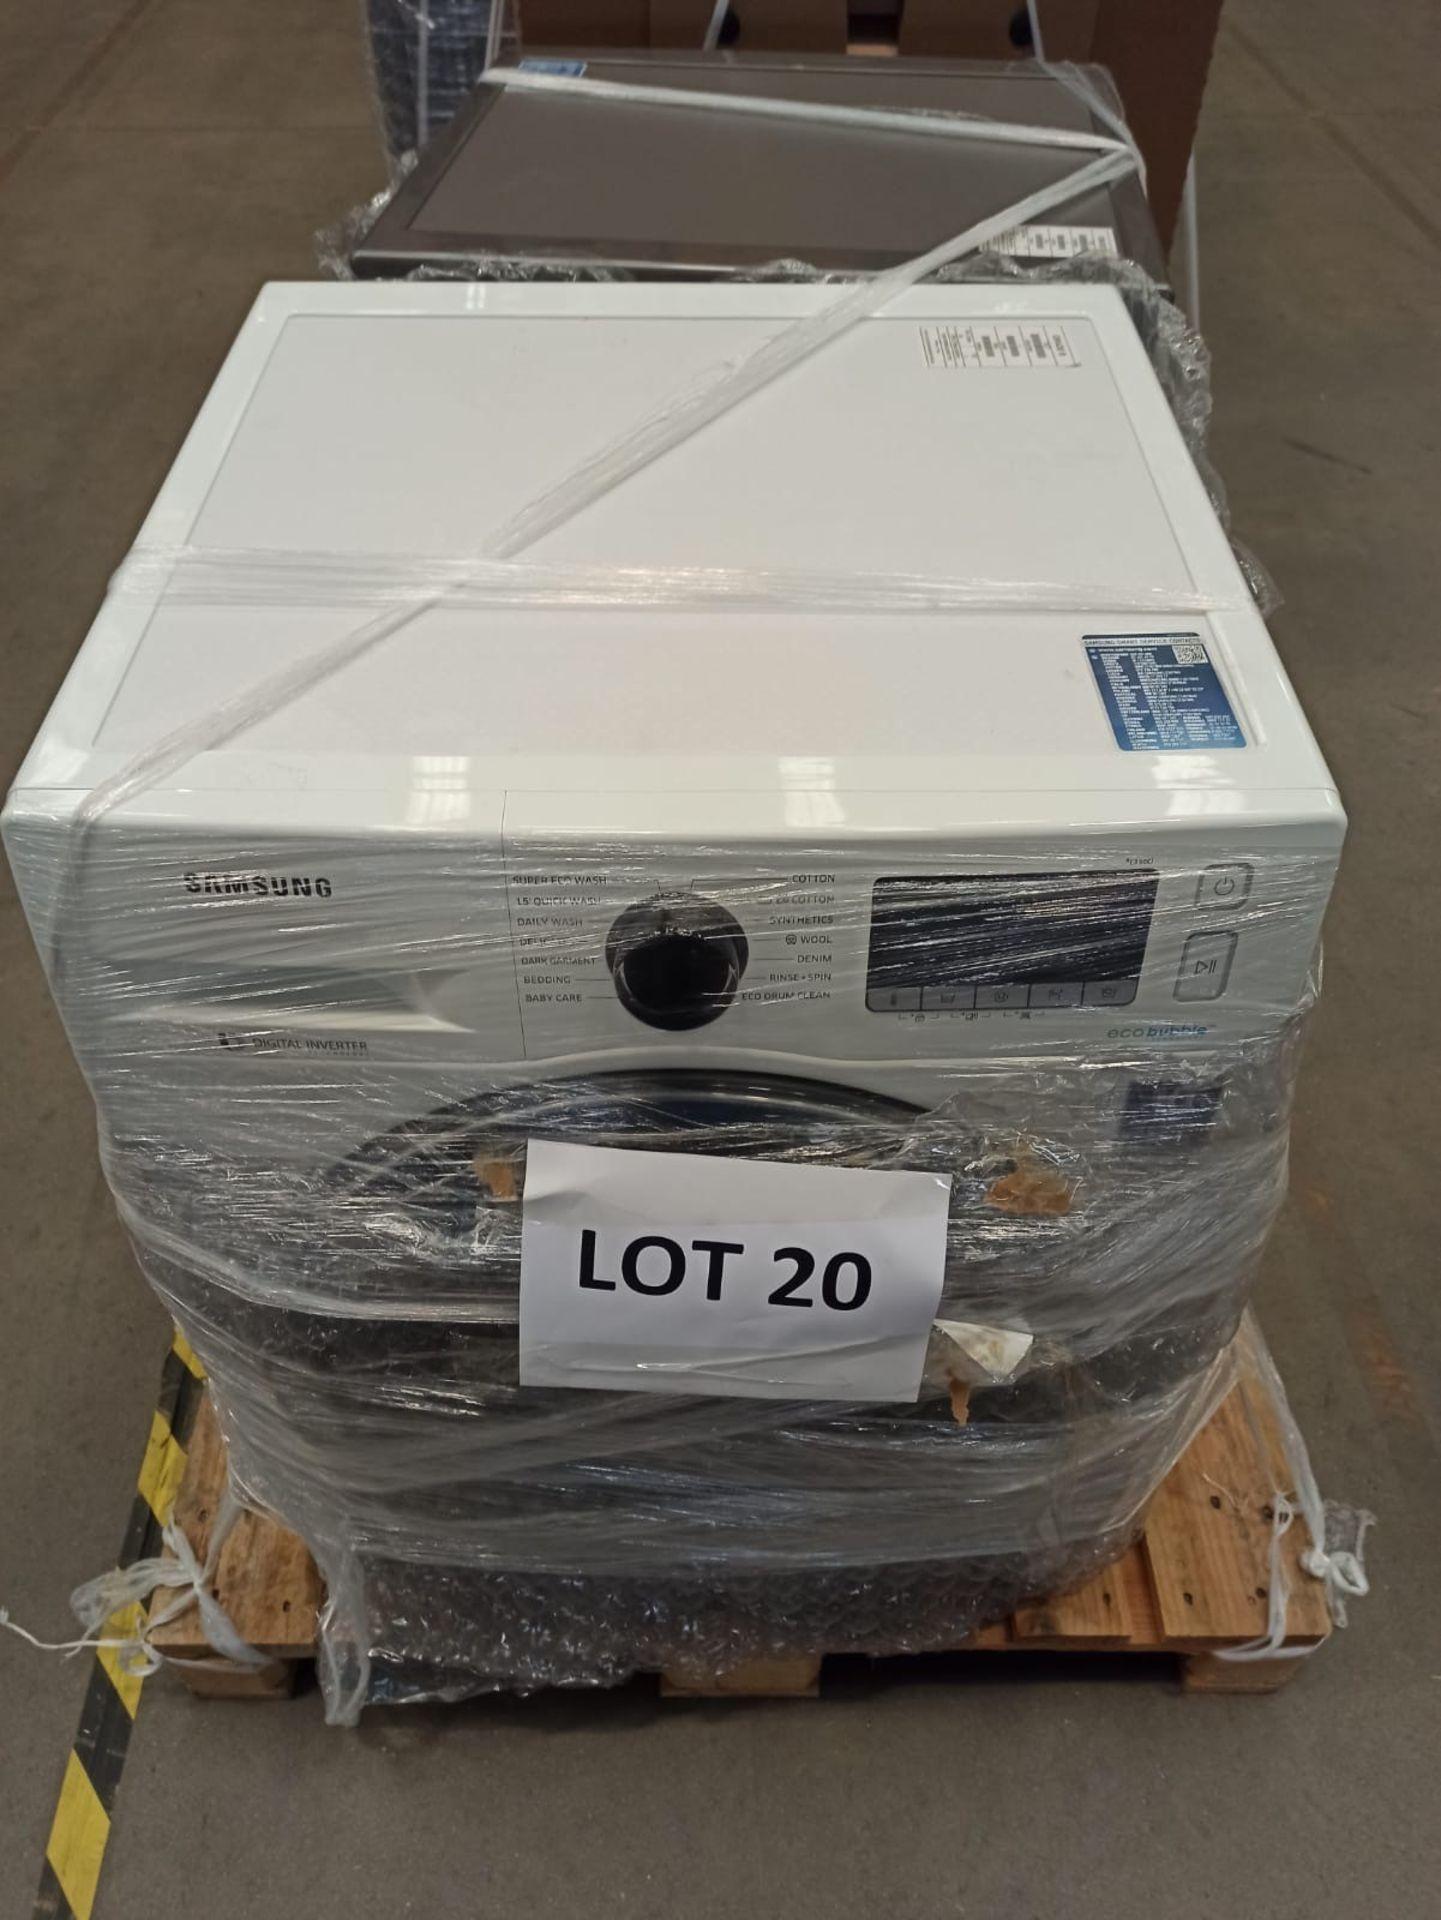 Pallet of 2 Samsung Premium Washing machines. Latest selling price £738 - Image 5 of 8